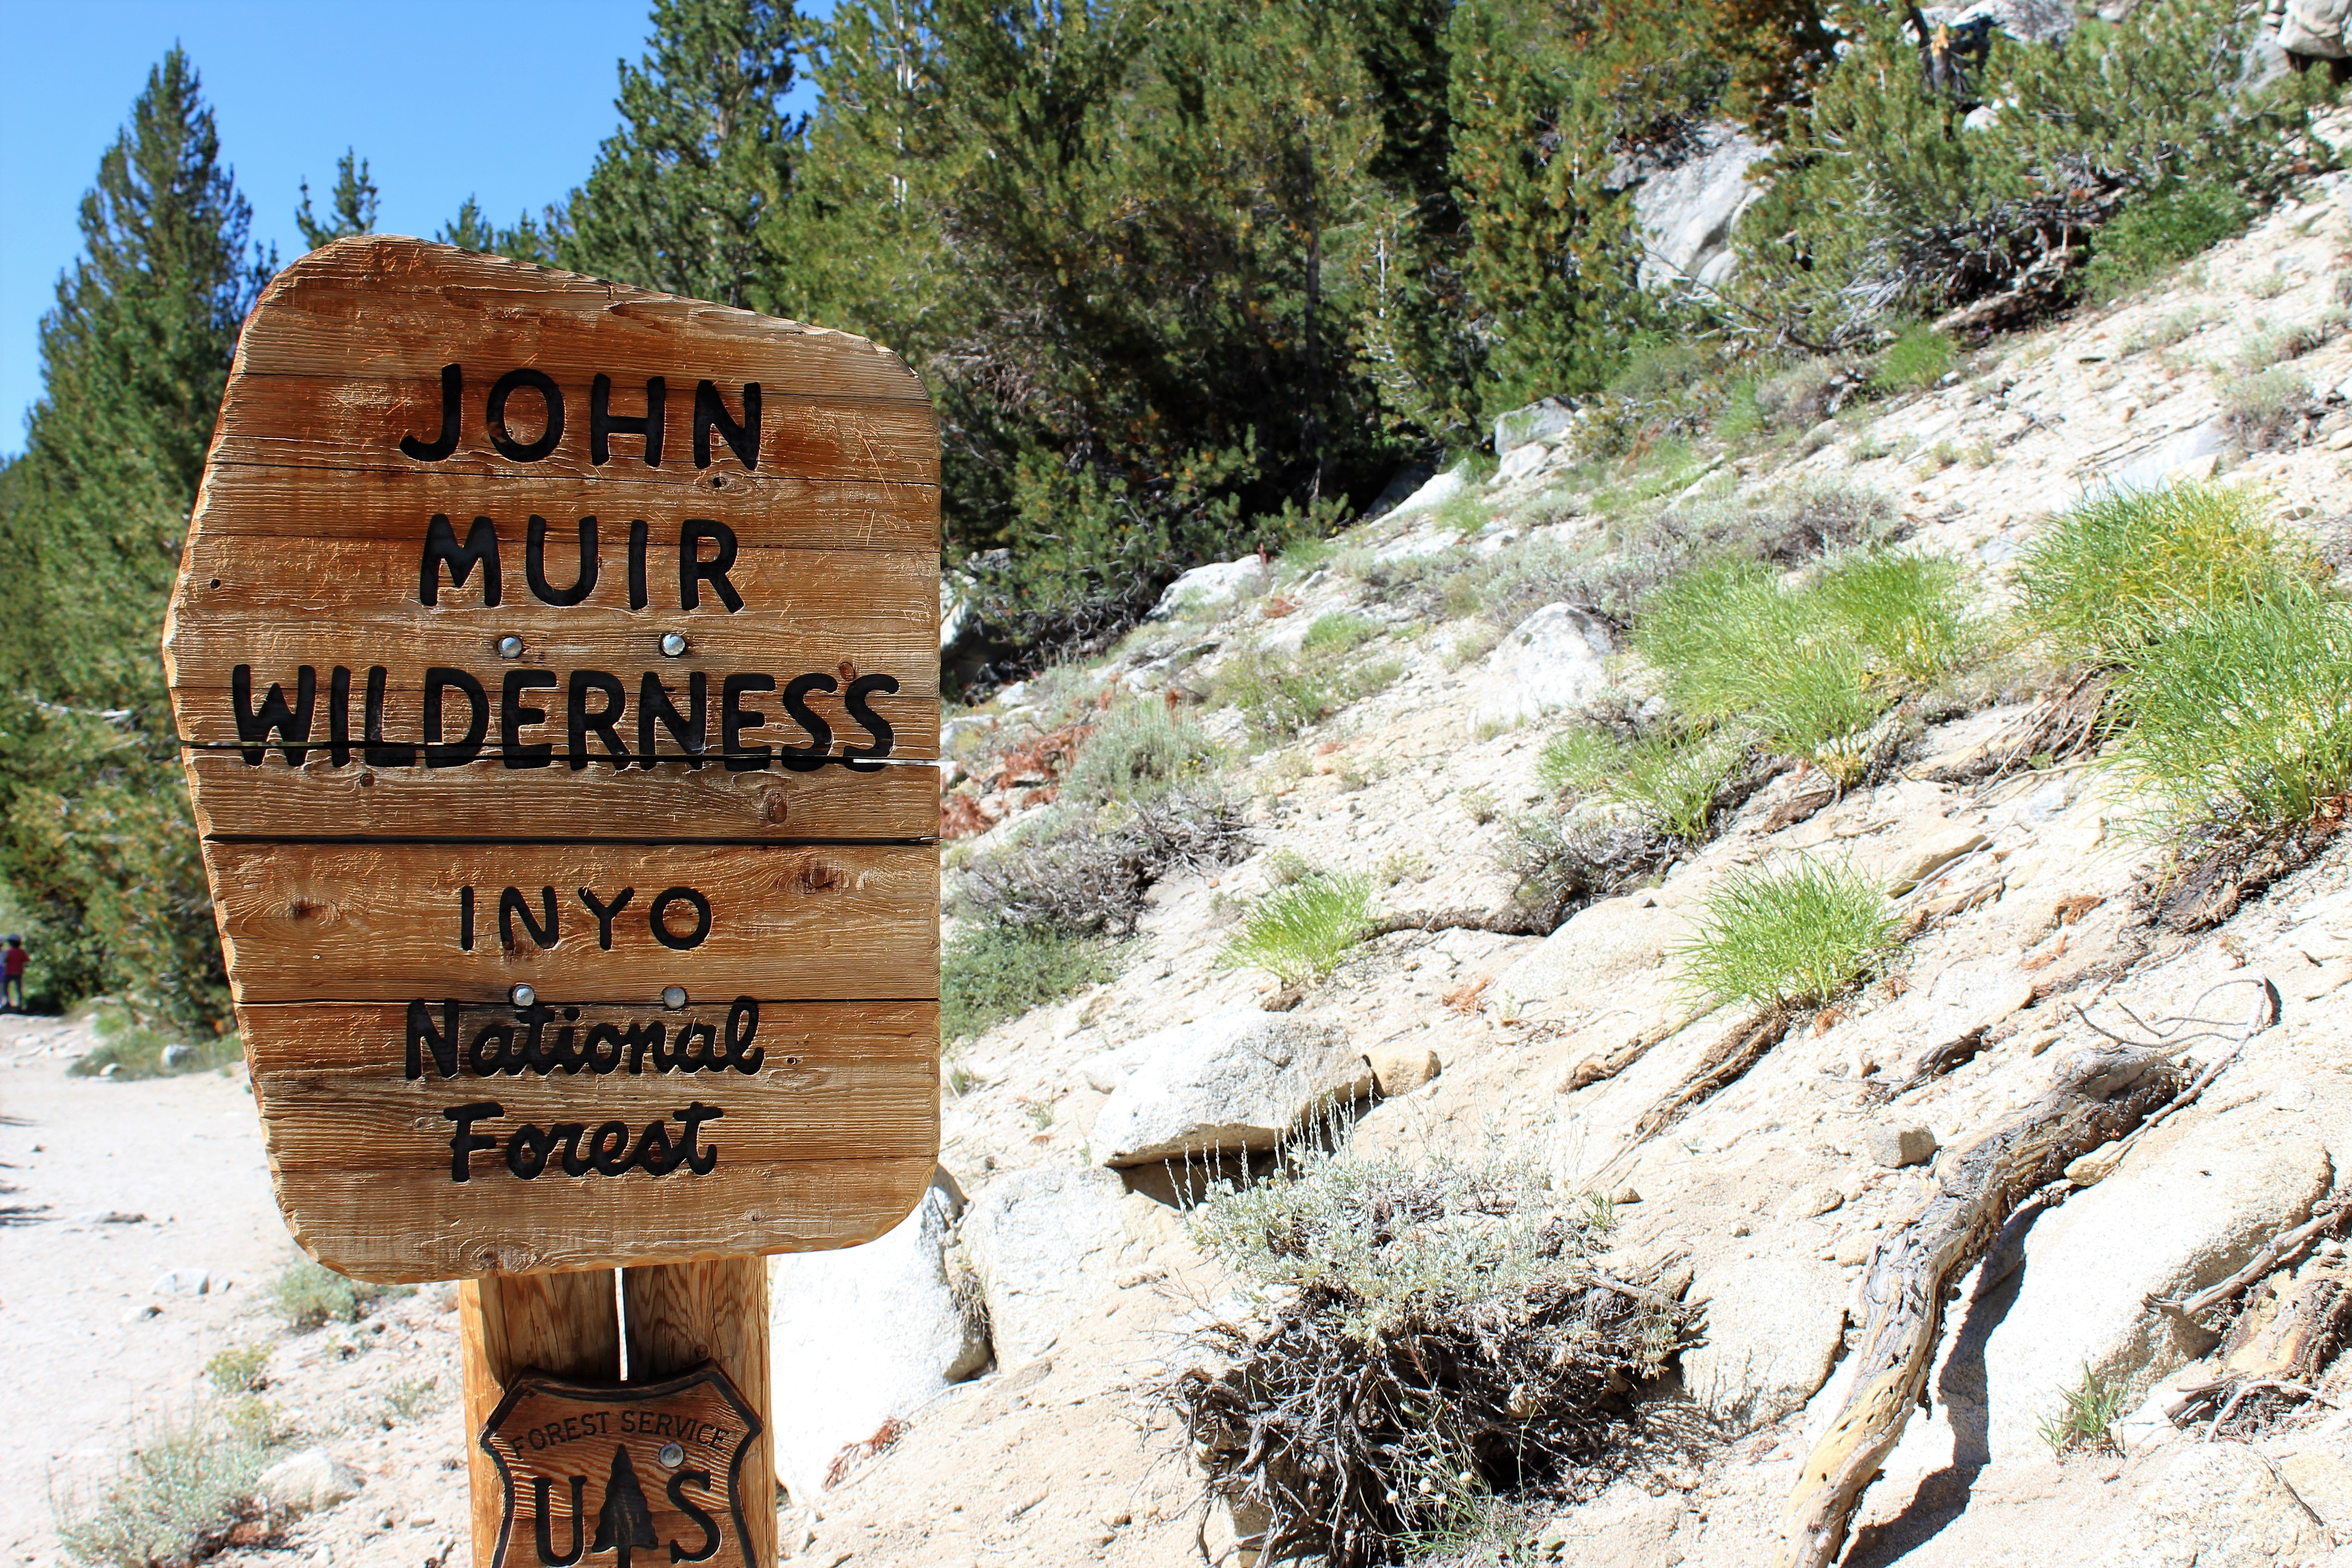 John muir wilderness signage photo